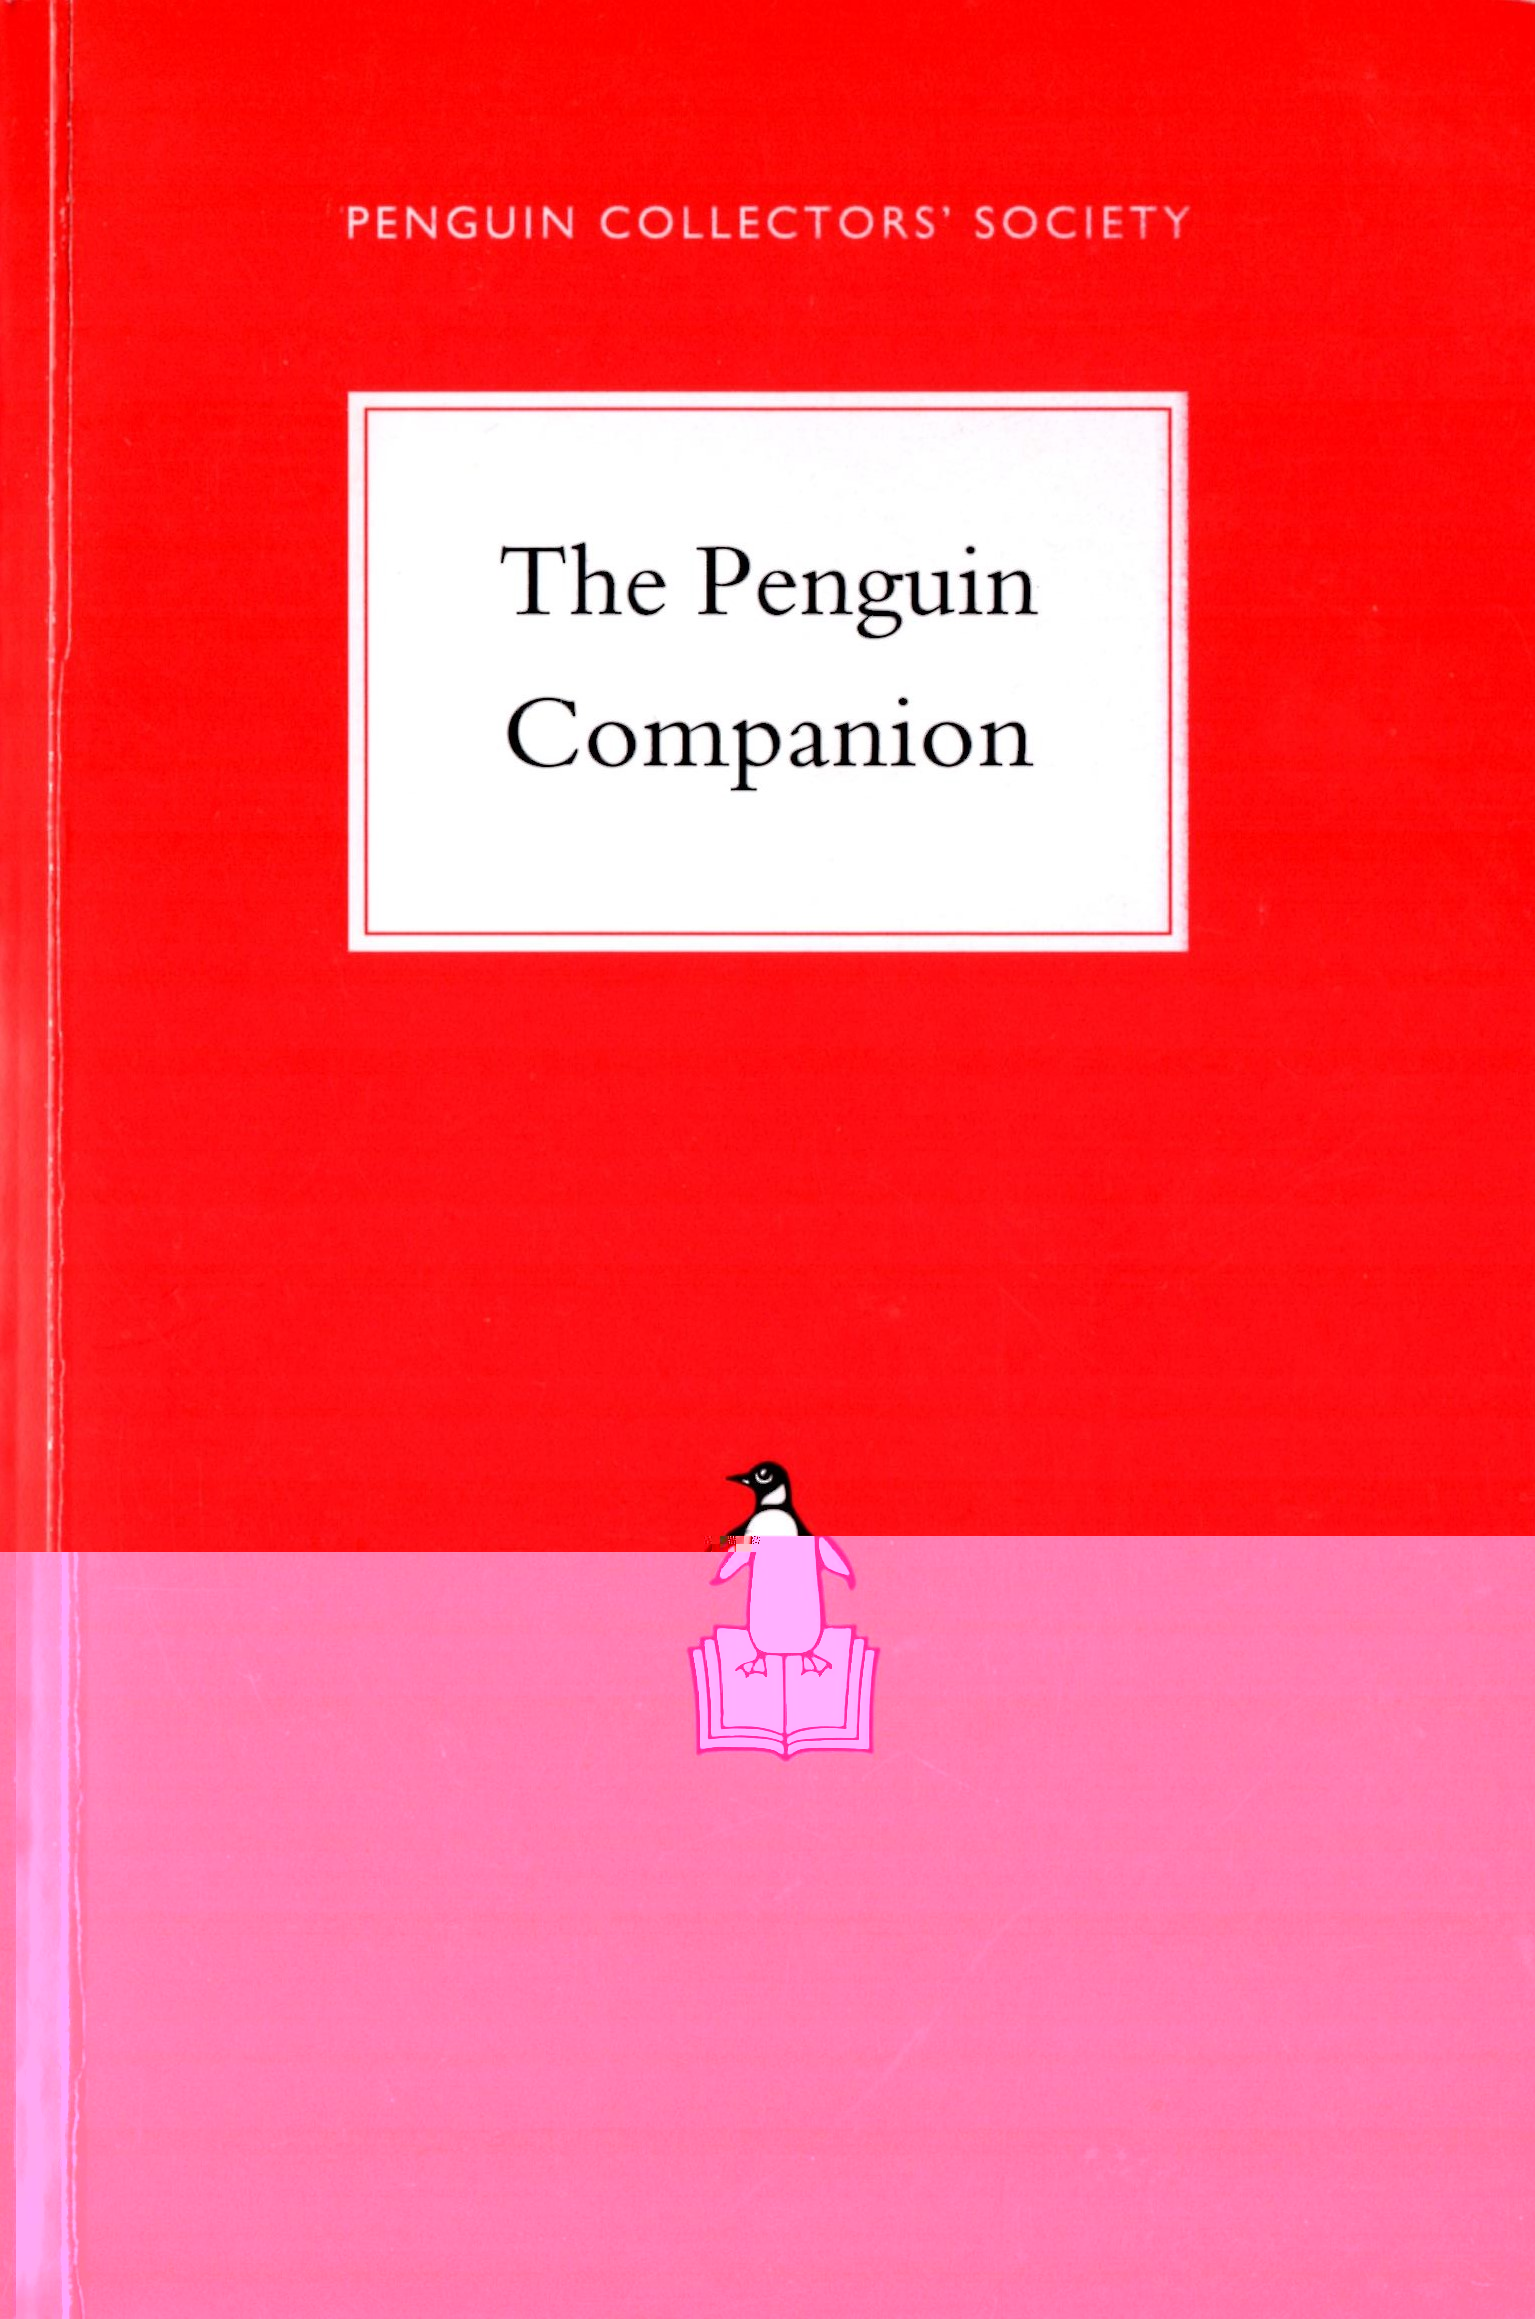 The Penguin Companion Image 1